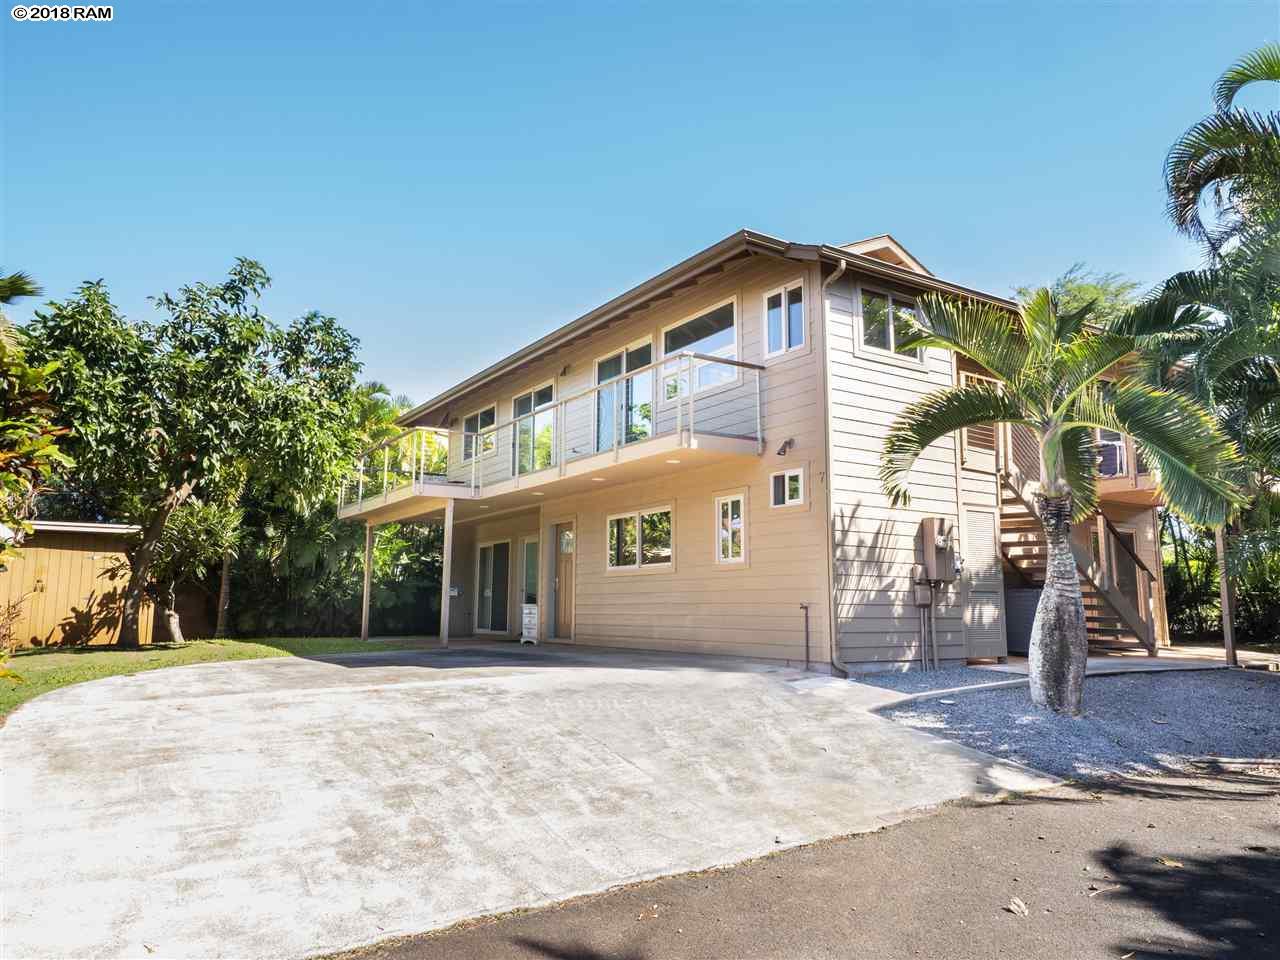 kuau maui real estate homes for sale maui hawaii real estate. Black Bedroom Furniture Sets. Home Design Ideas